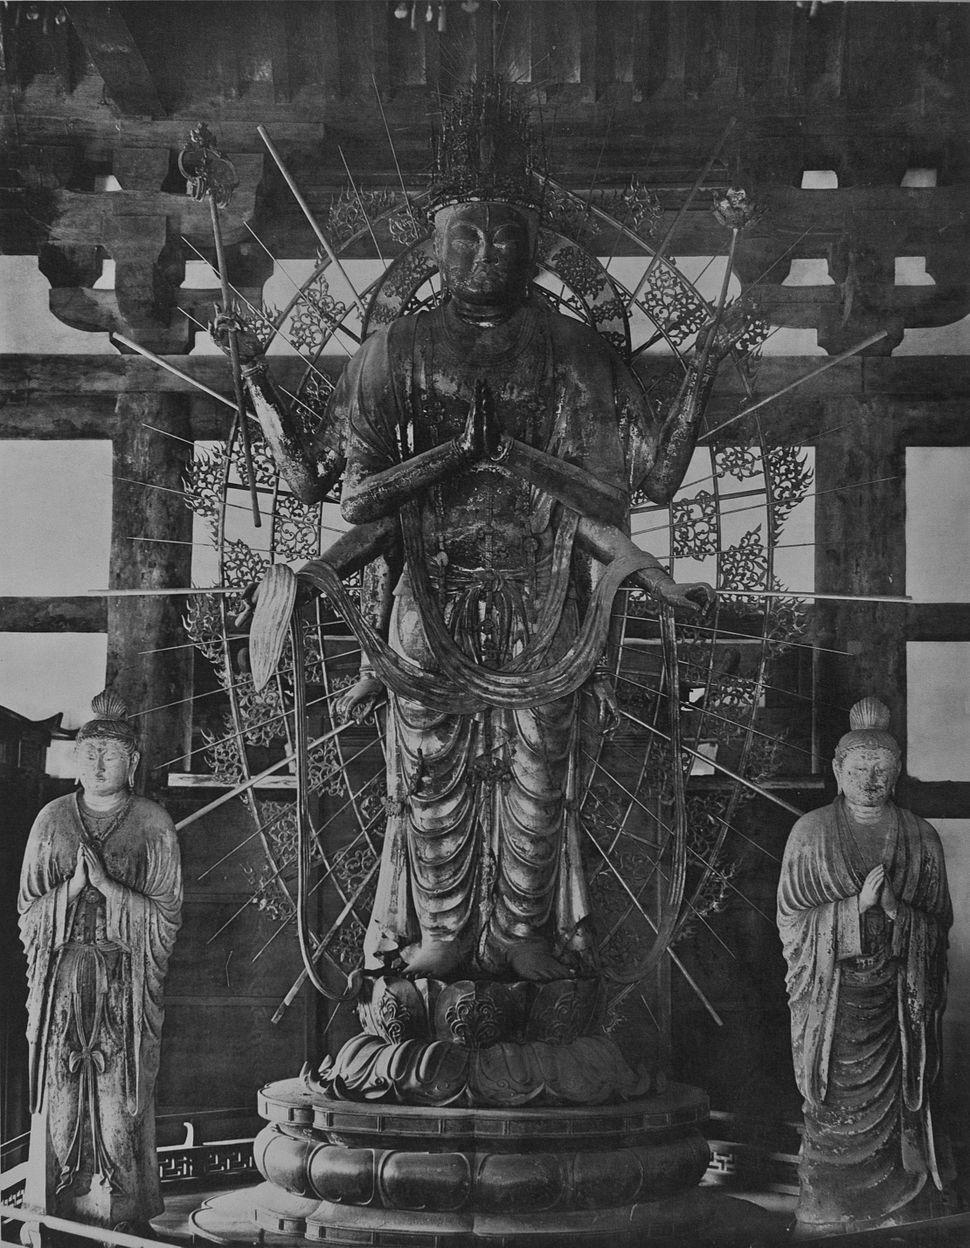 Todaiji Monaster Fukukensaku Kwannon of Hokkedo (232)